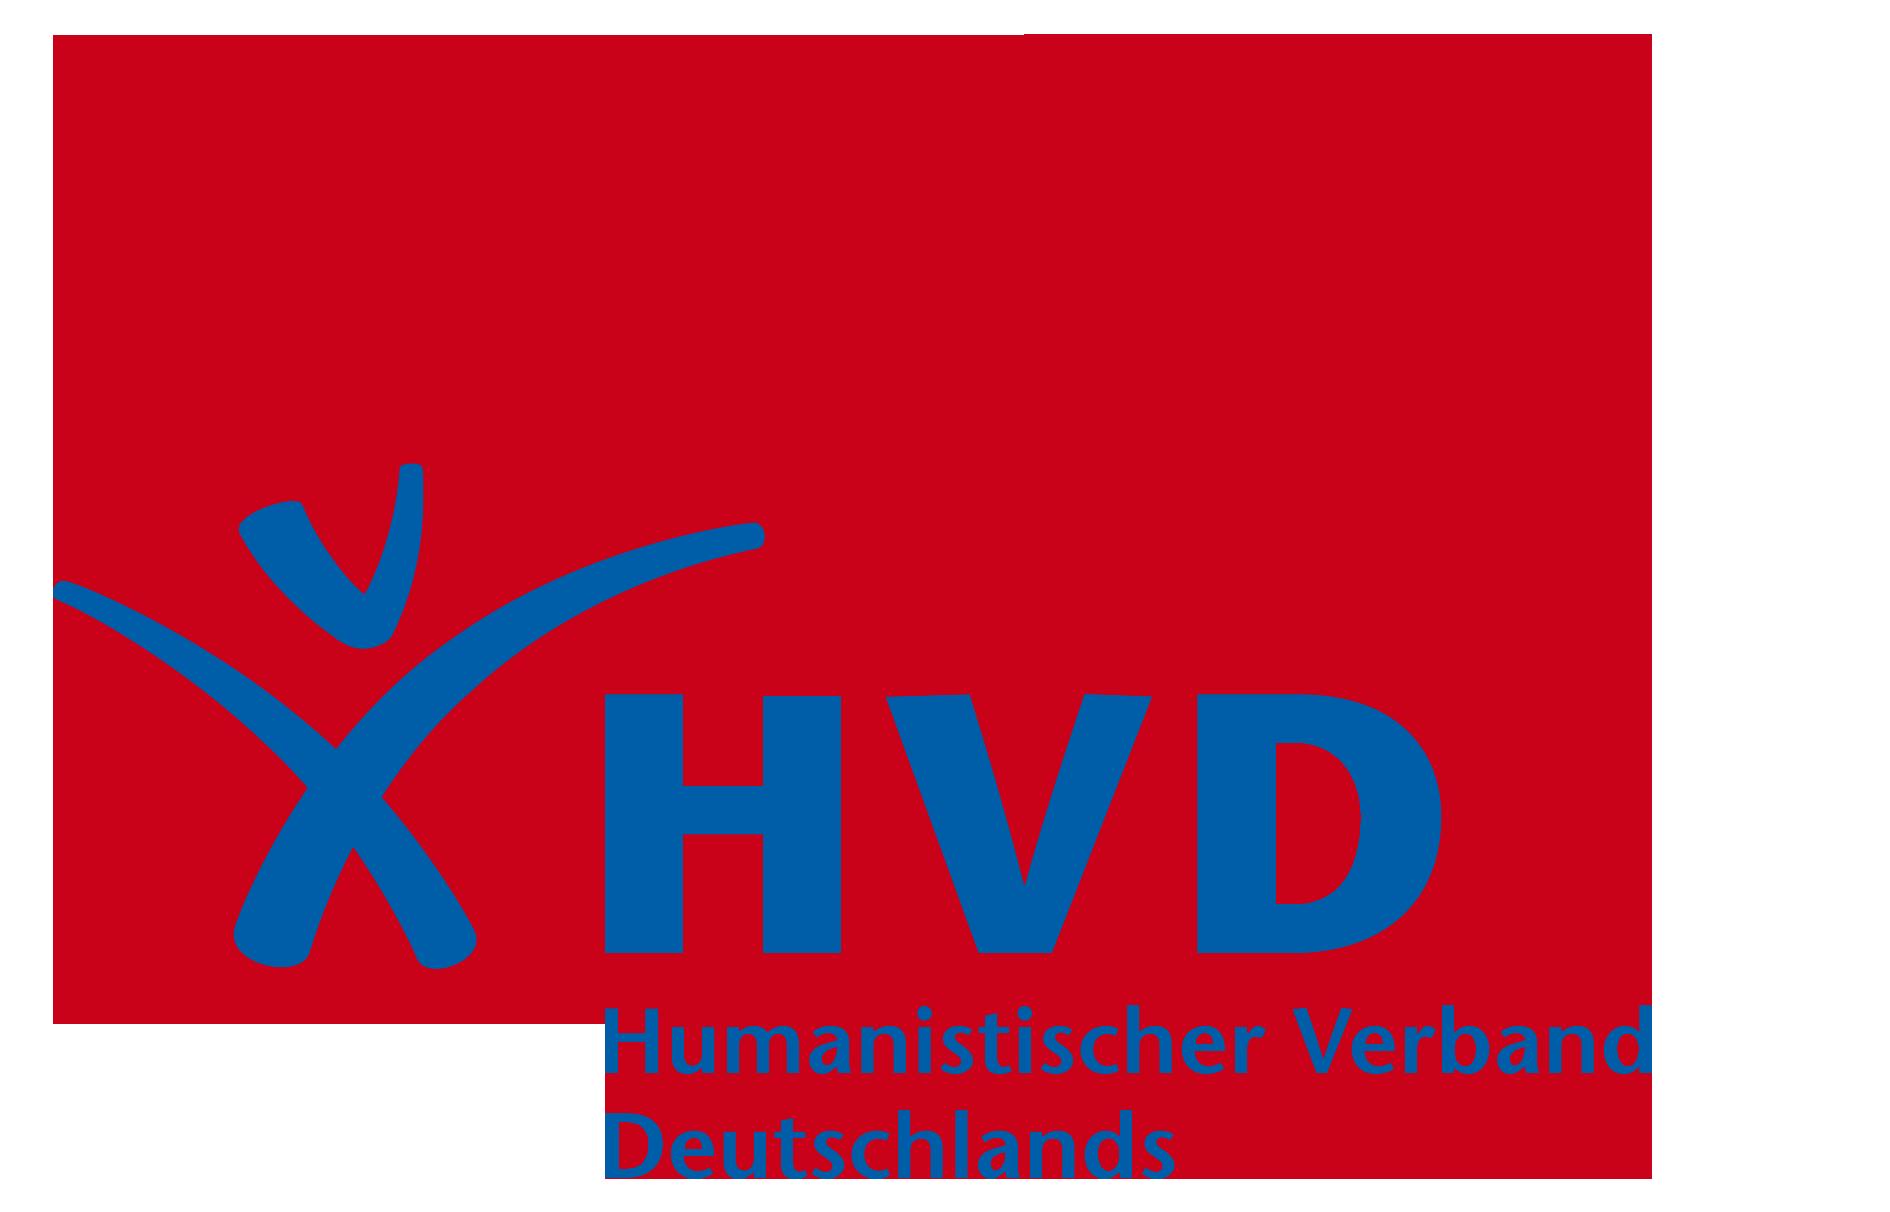 Patientenverfügung | ONLINE | HVD